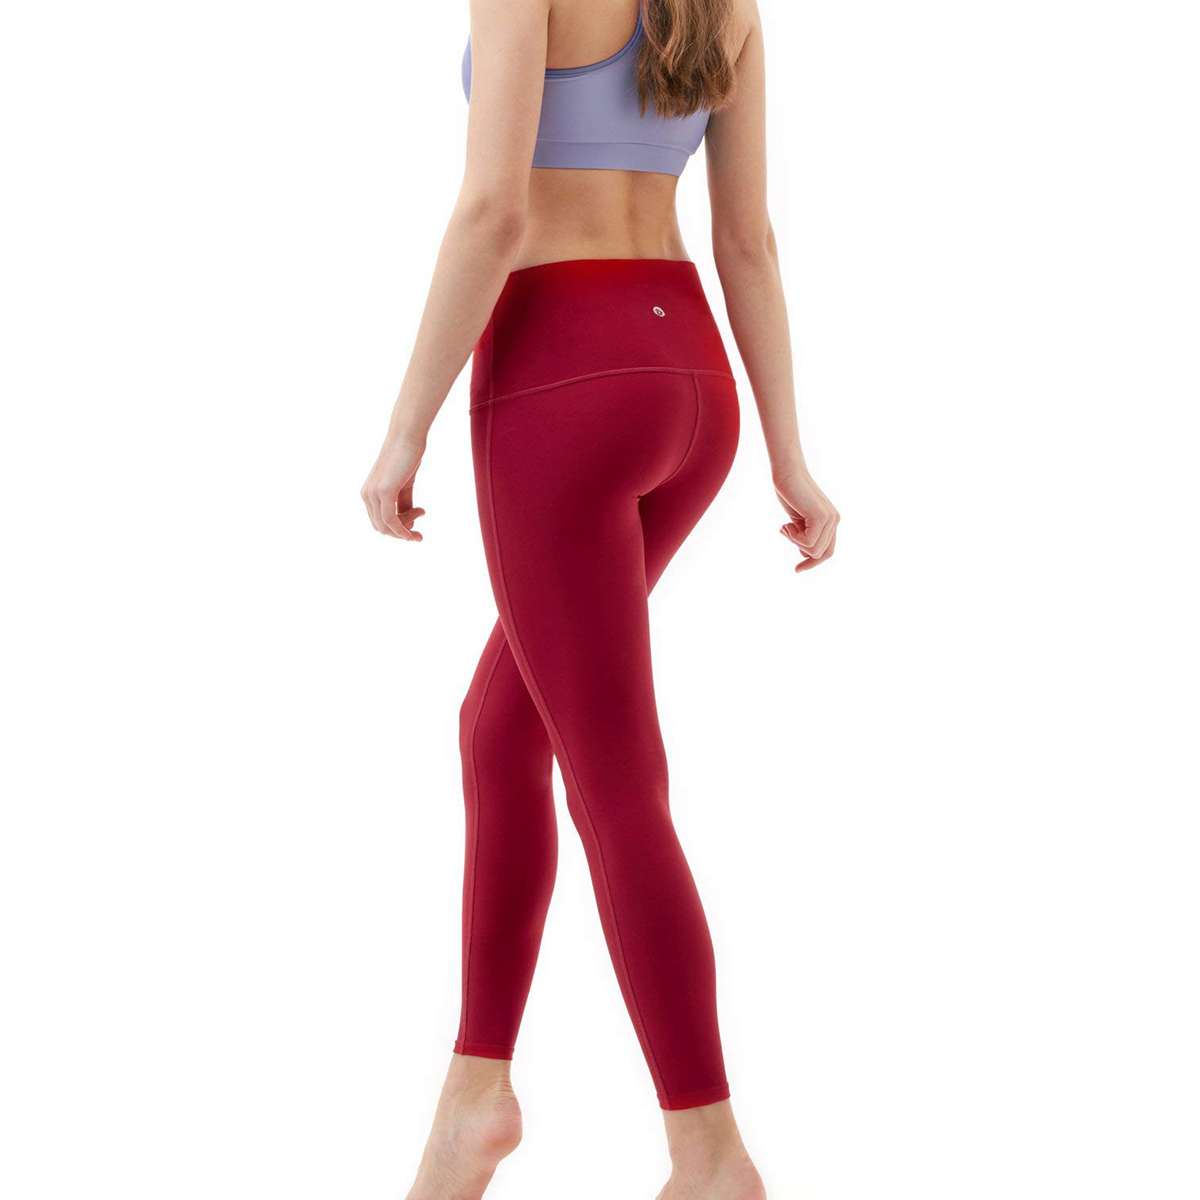 thumbnail 29 - TSLA Tesla FYP52 Women's High-Waisted Ultra-Stretch Tummy Control Yoga Pants